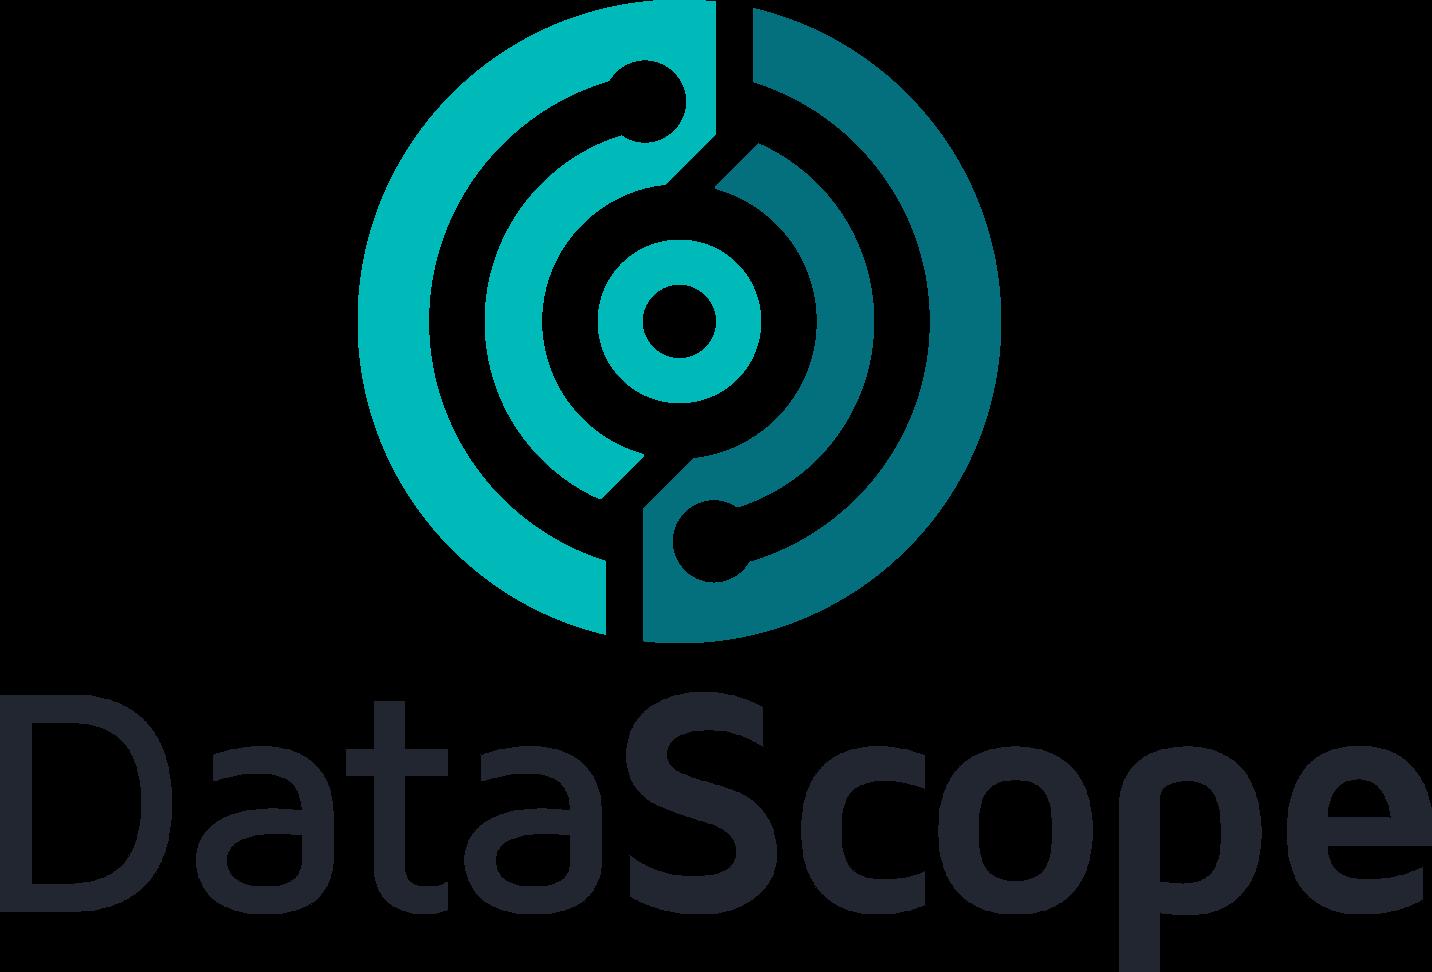 Empresas Desafio10x: DataScope SpA